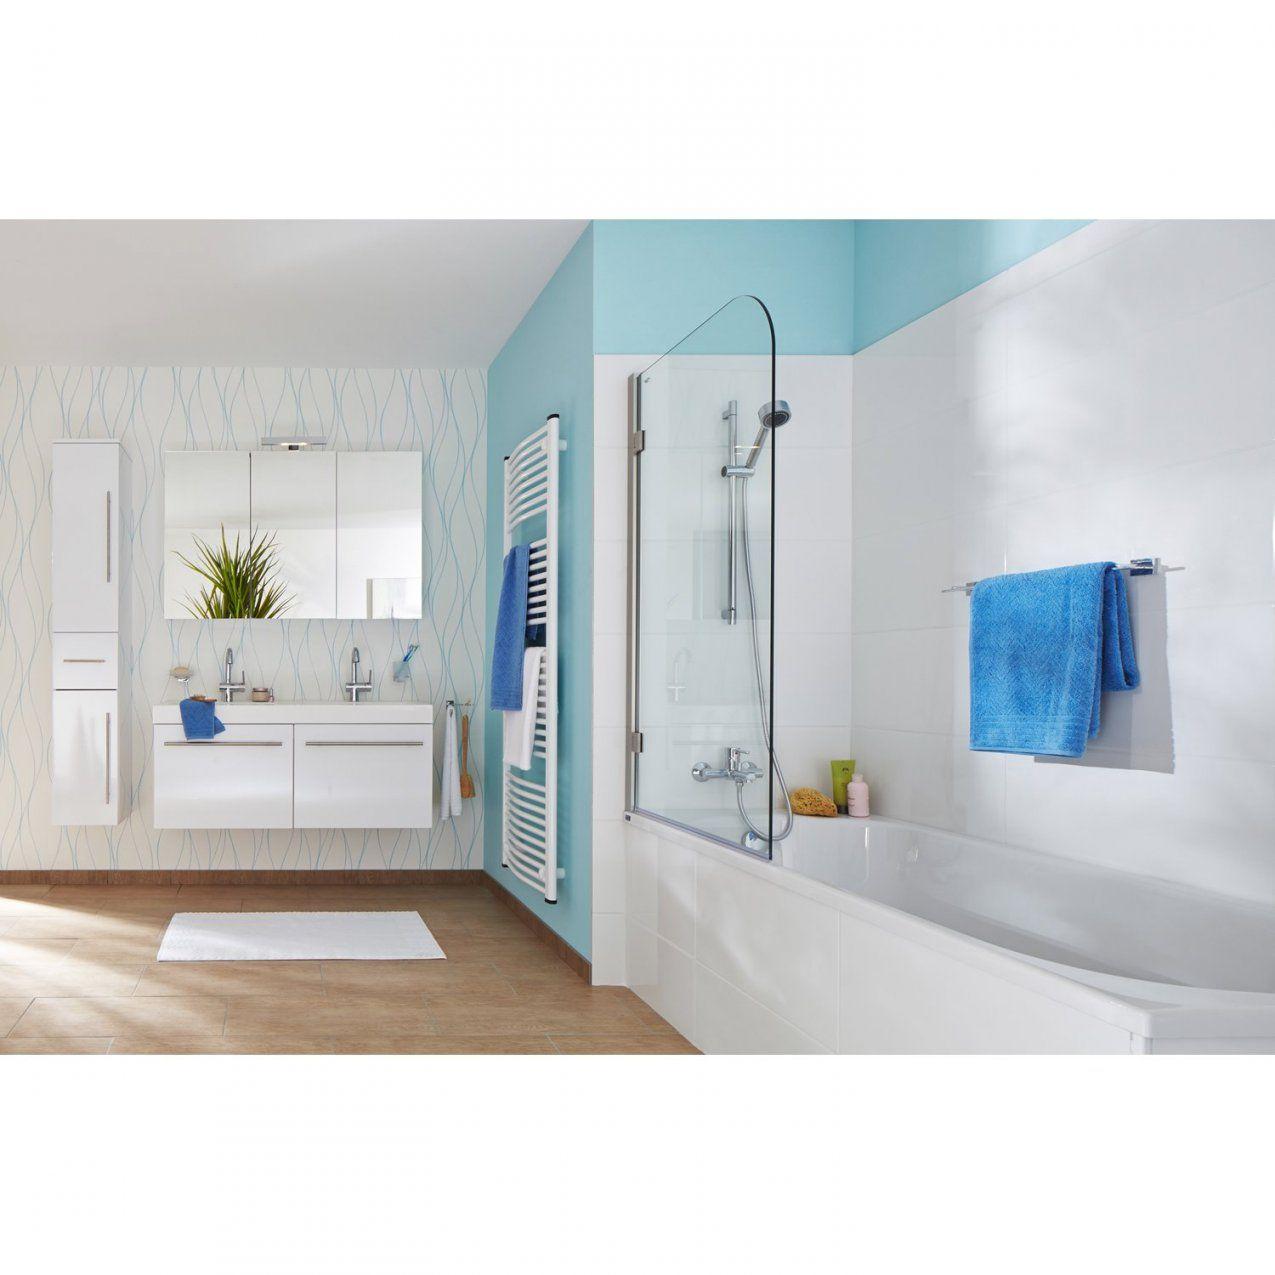 duschwand f r badewanne obi haus design ideen. Black Bedroom Furniture Sets. Home Design Ideas